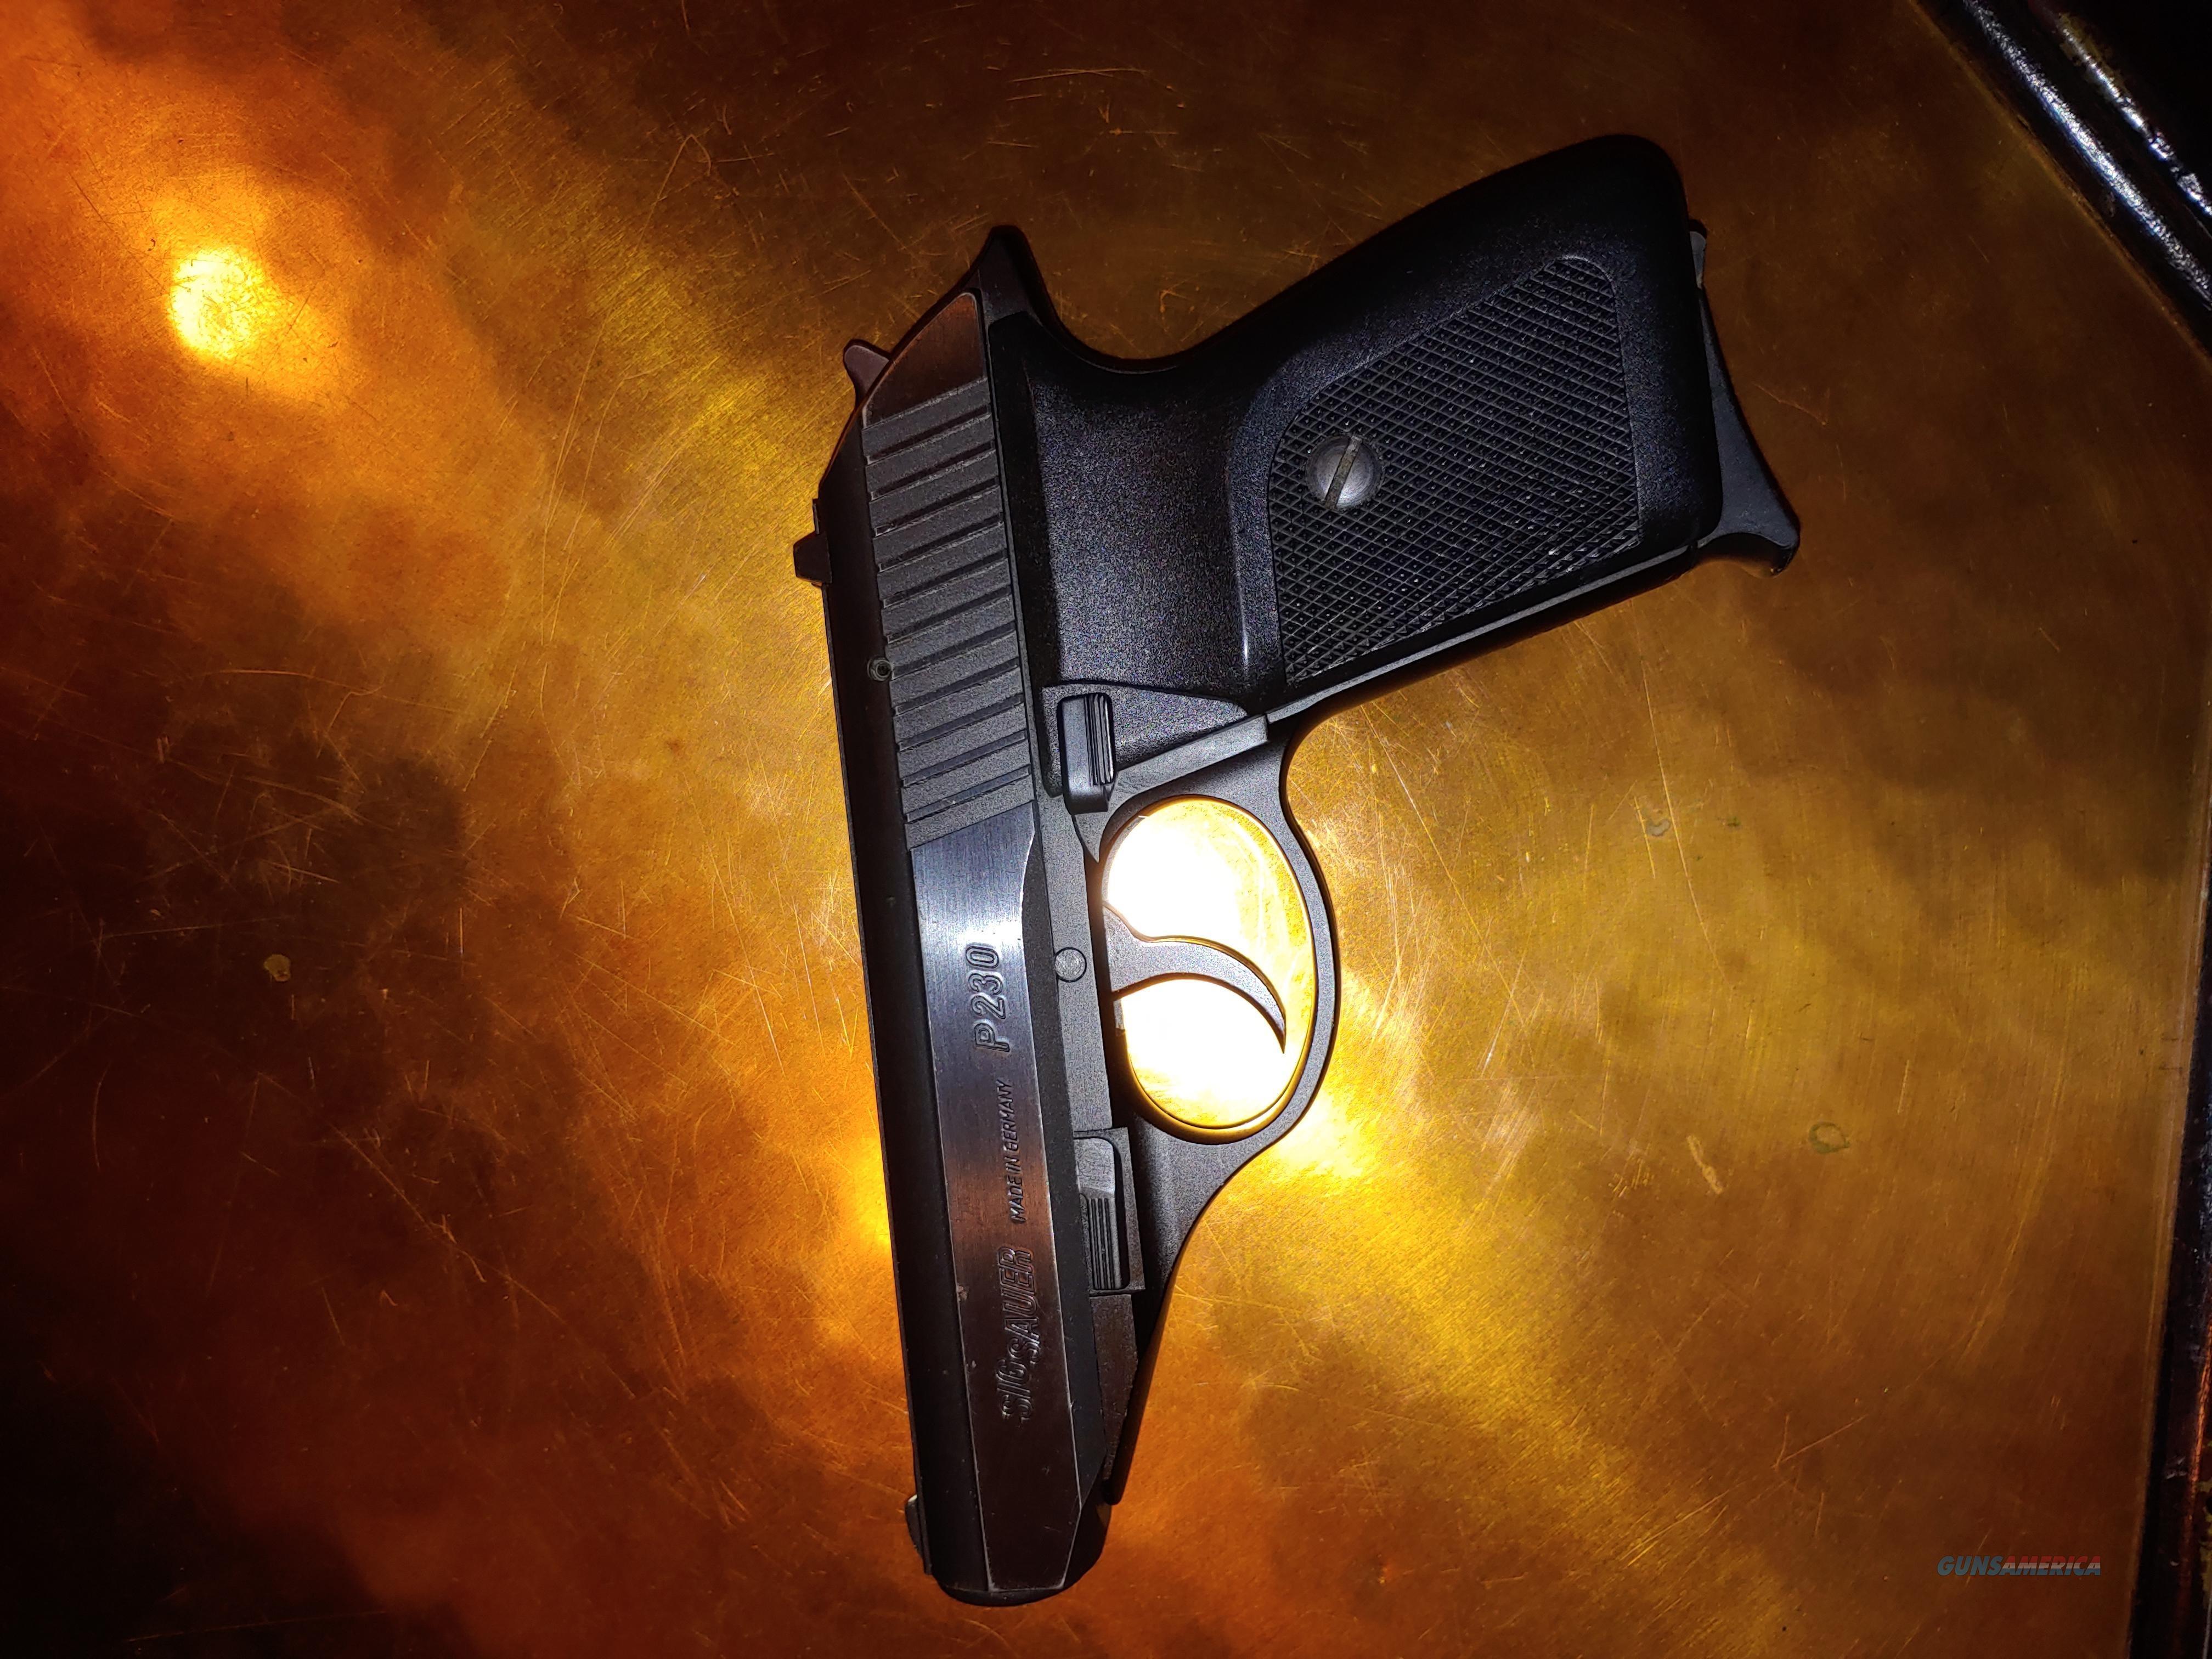 Sig 230  Guns > Pistols > Sig - Sauer/Sigarms Pistols > P230